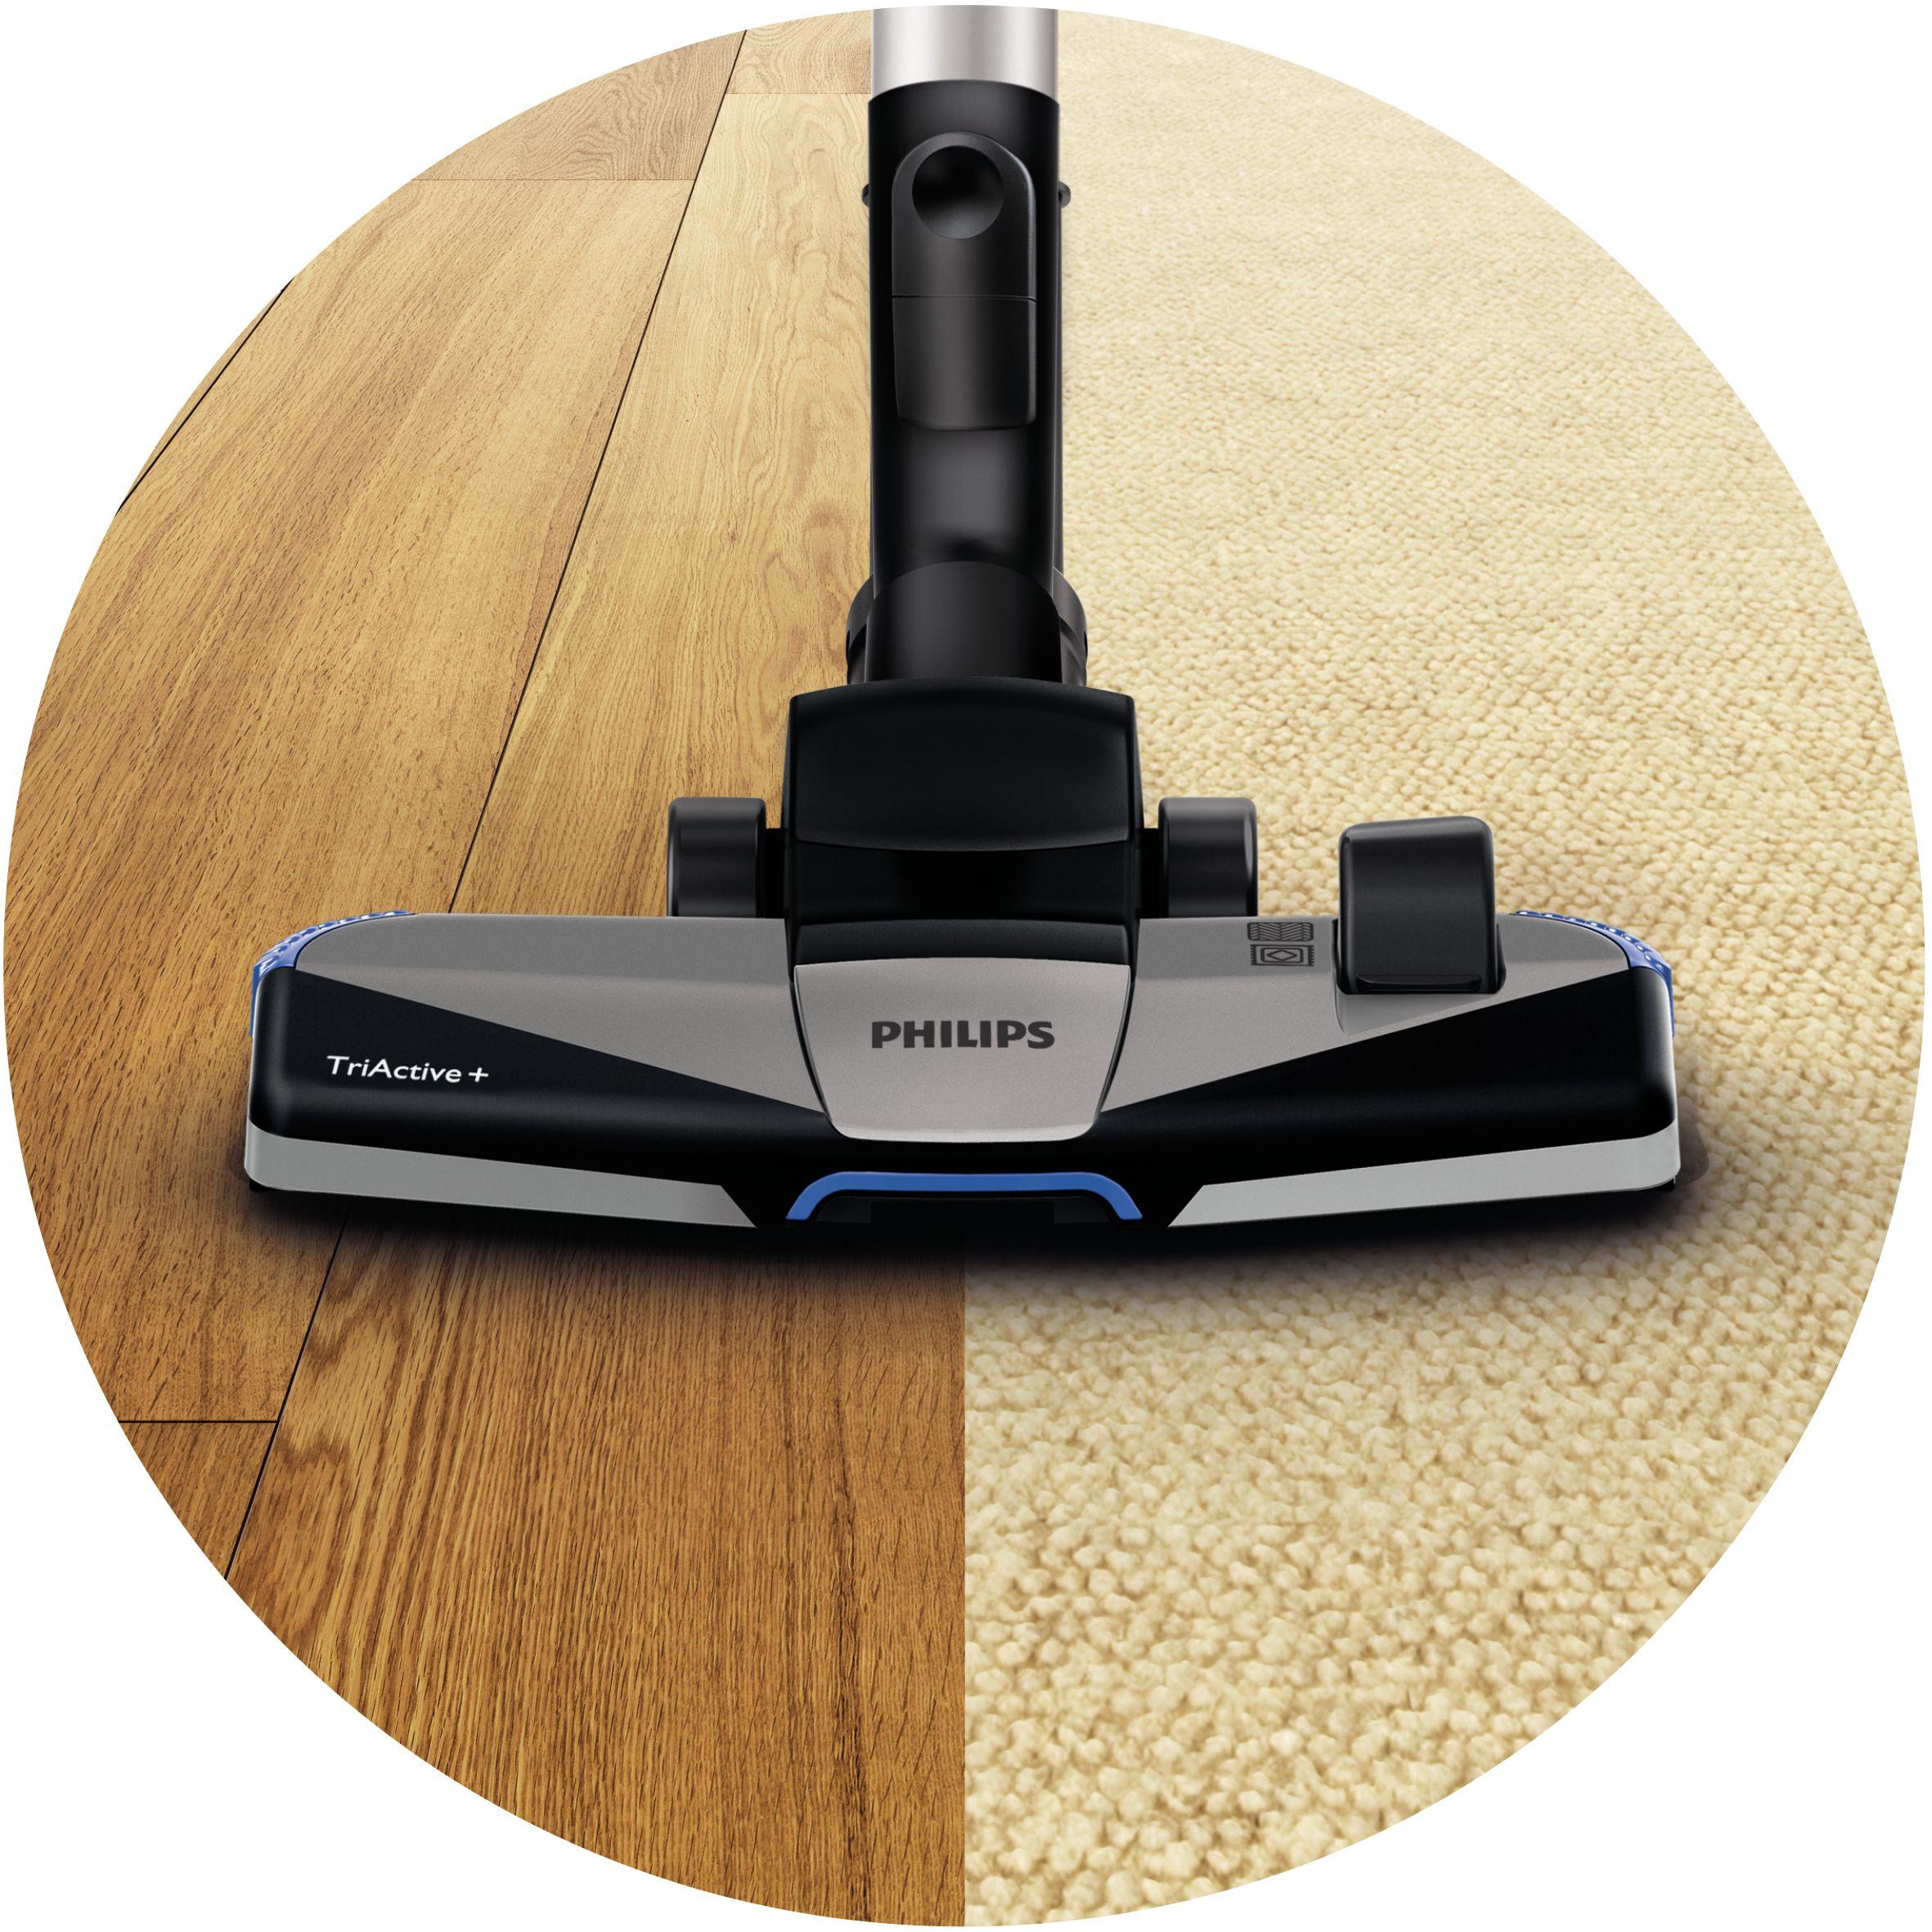 philips powerpro expert fc9745 09 beutelloser staubsauger. Black Bedroom Furniture Sets. Home Design Ideas